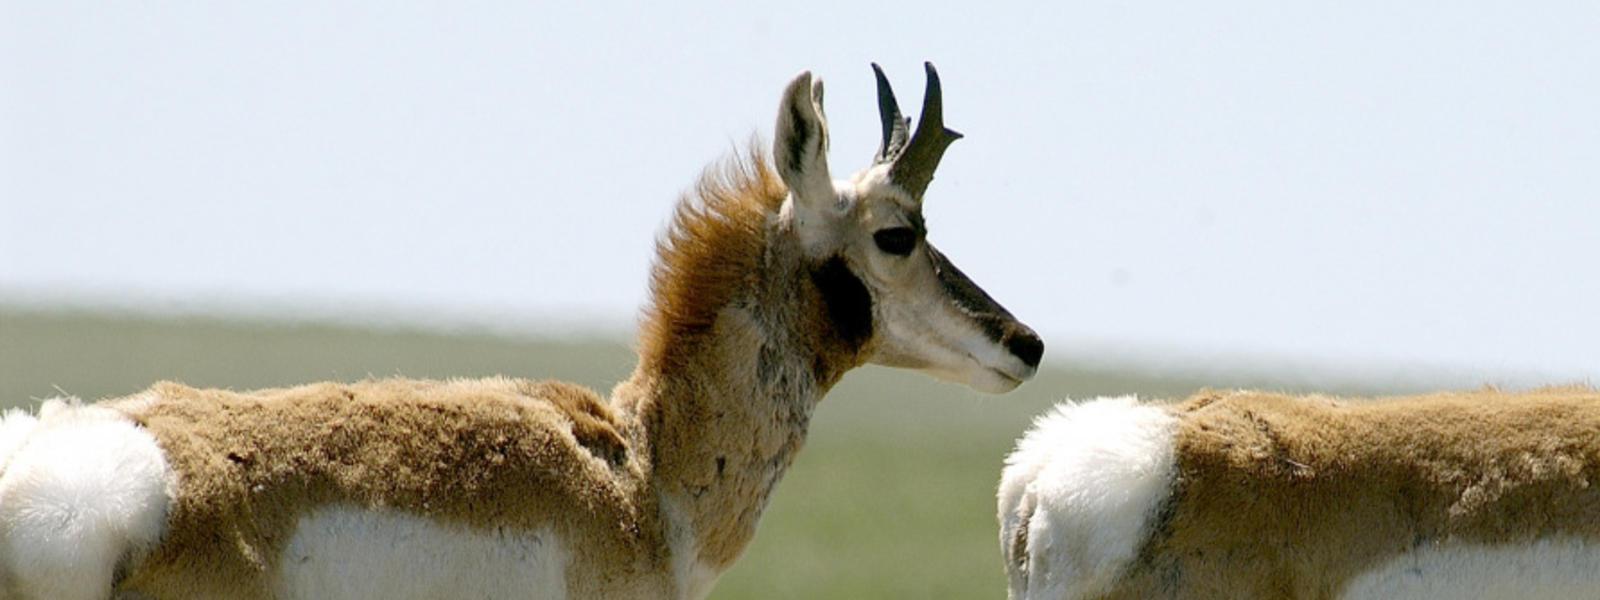 Pronghorn | Species | WWF